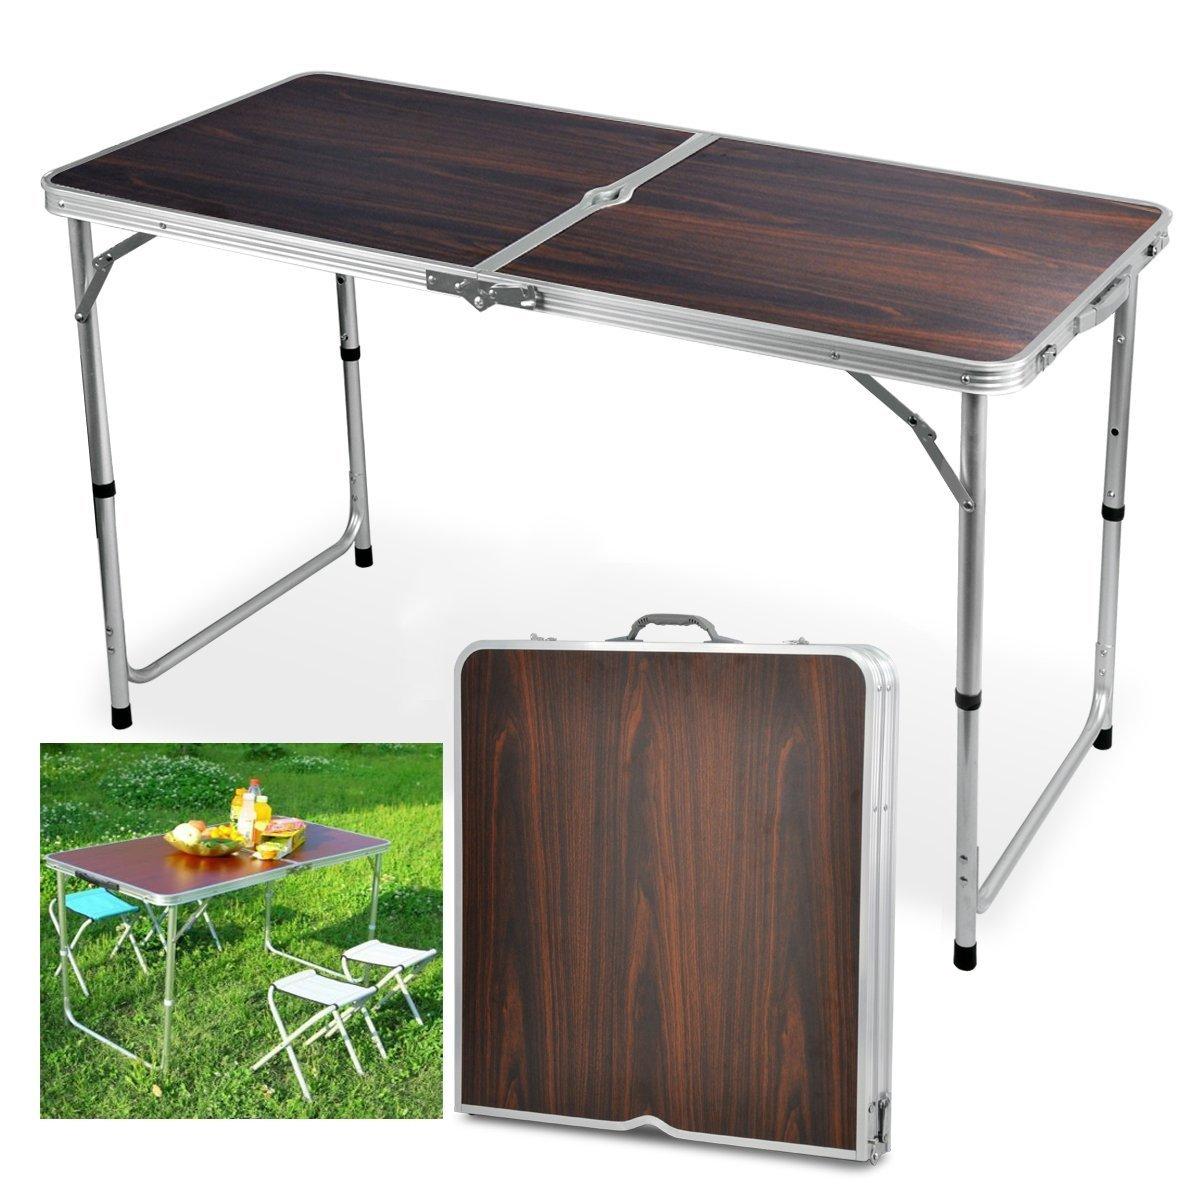 Amazon.de: Yaheetech Gartentisch Klapptisch Campingtisch Falttisch ...